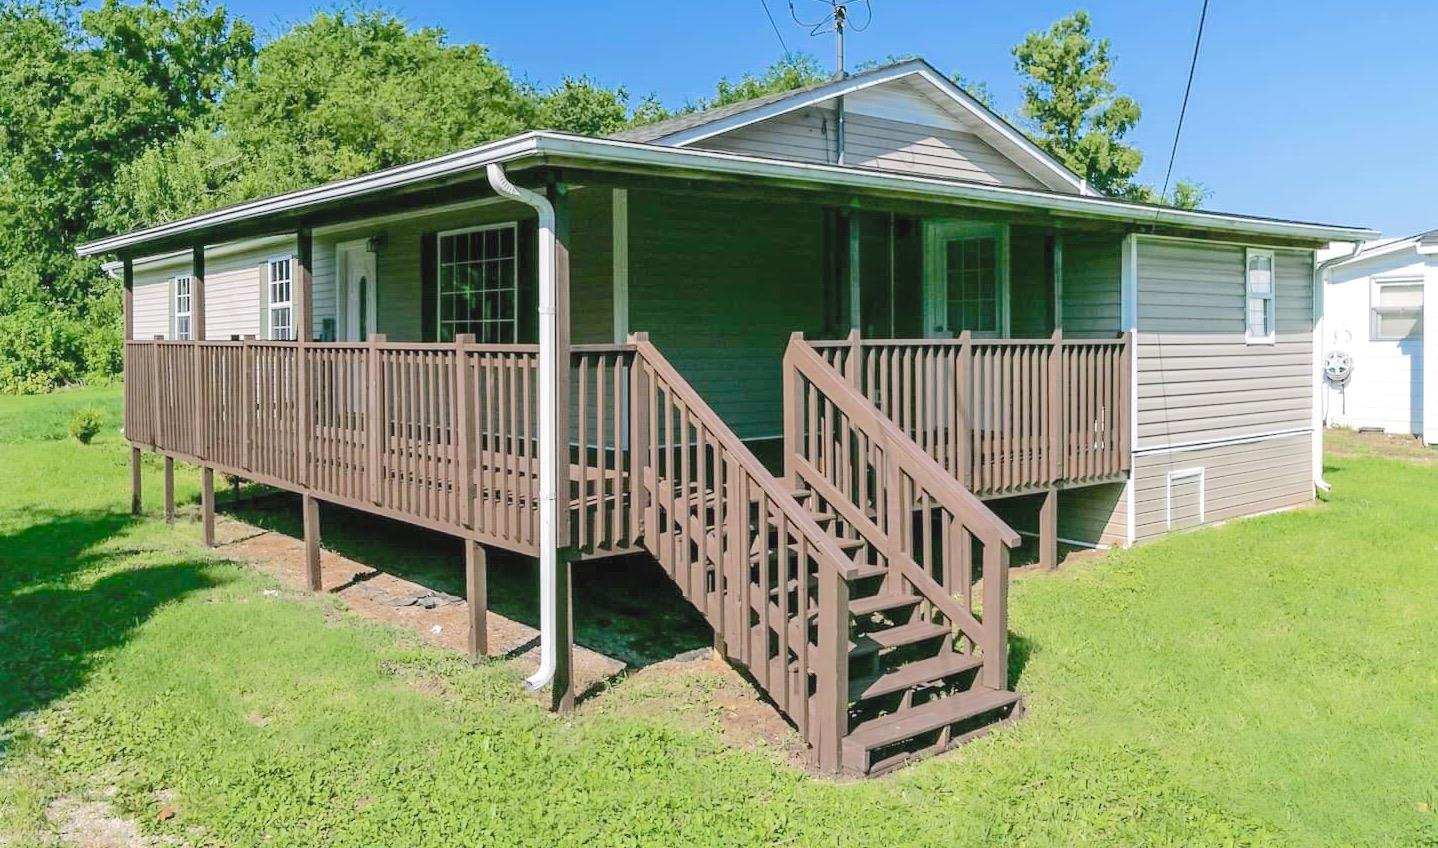 203 Garth Ln, Elkton, KY 42220 - Elkton, KY real estate listing